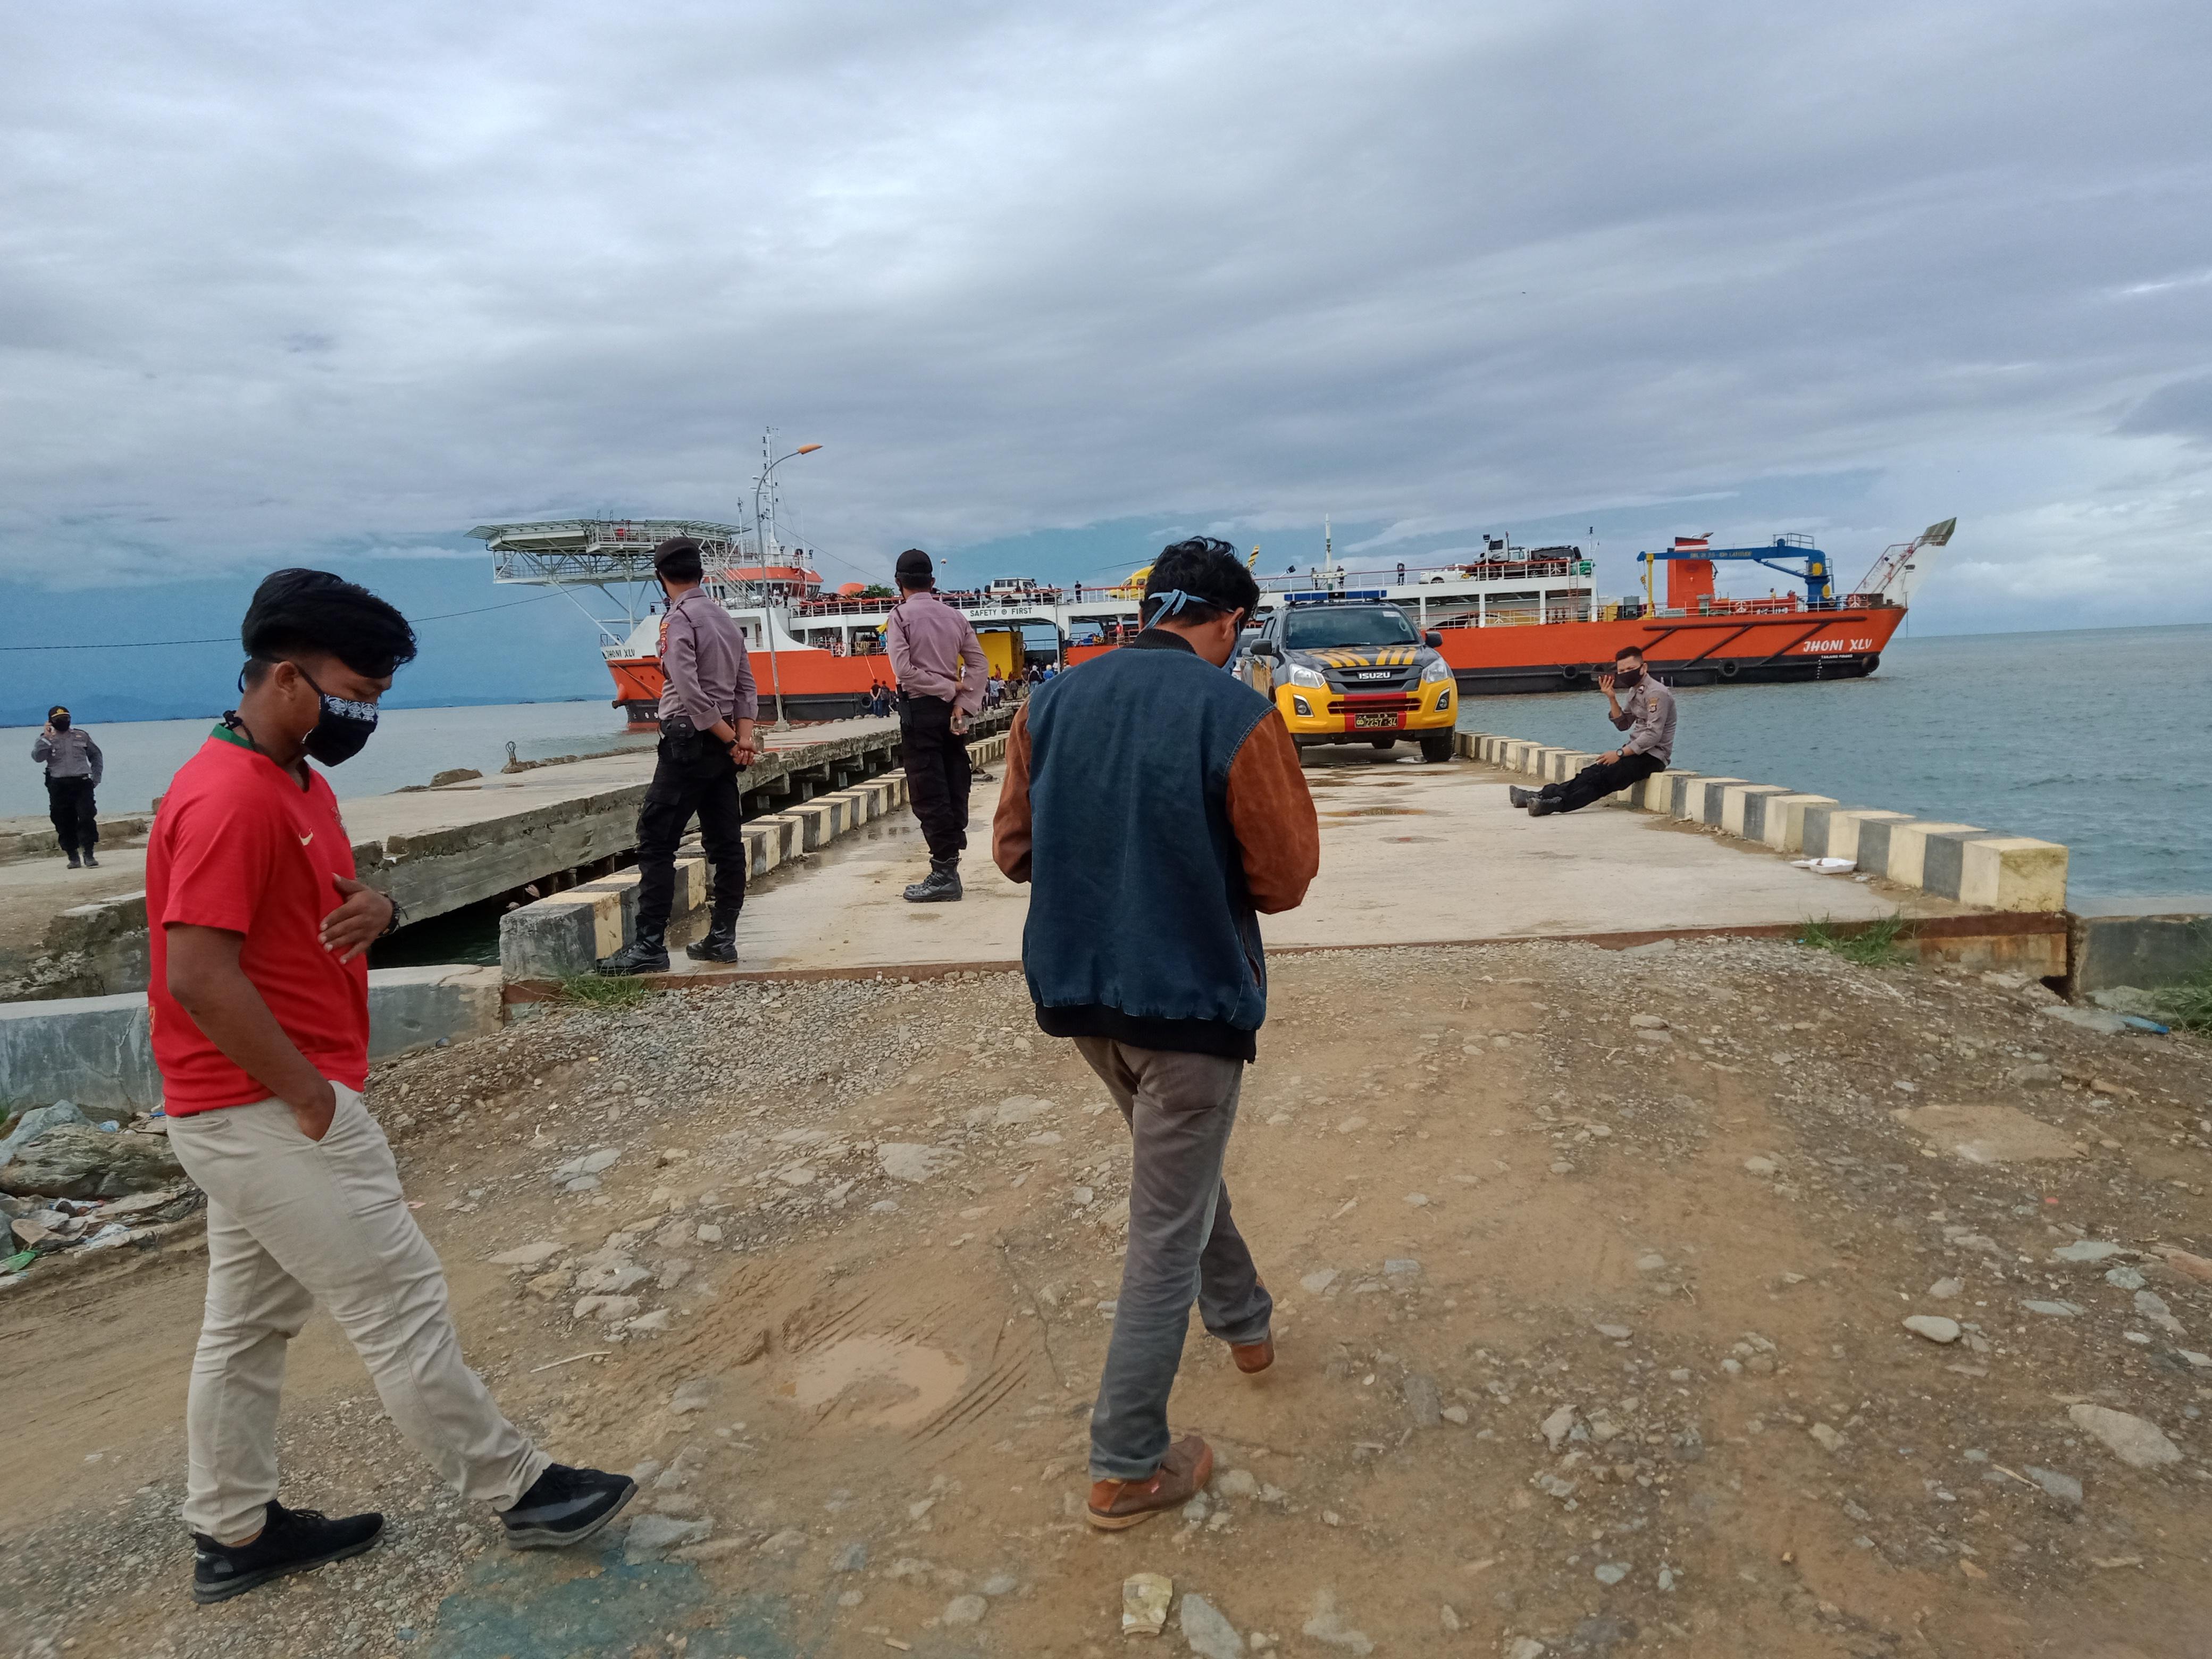 kapal Pengangkut Kendaraan milik PT. Jhonlin saat sandar di Pelabuhan Rakyat Kasipute